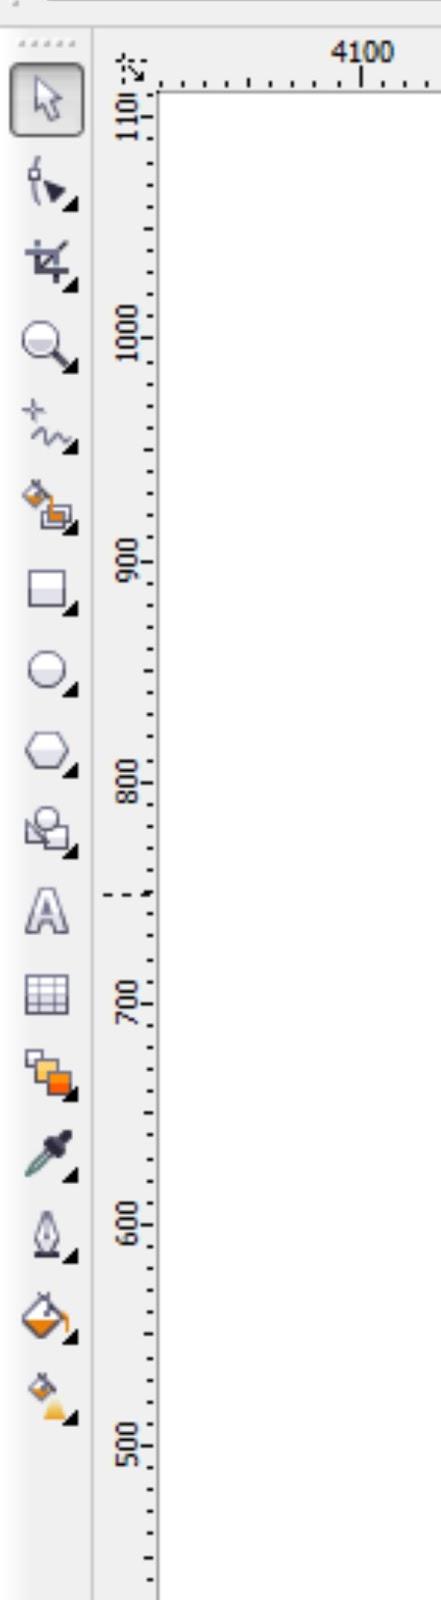 corel draw toolbox funcitons